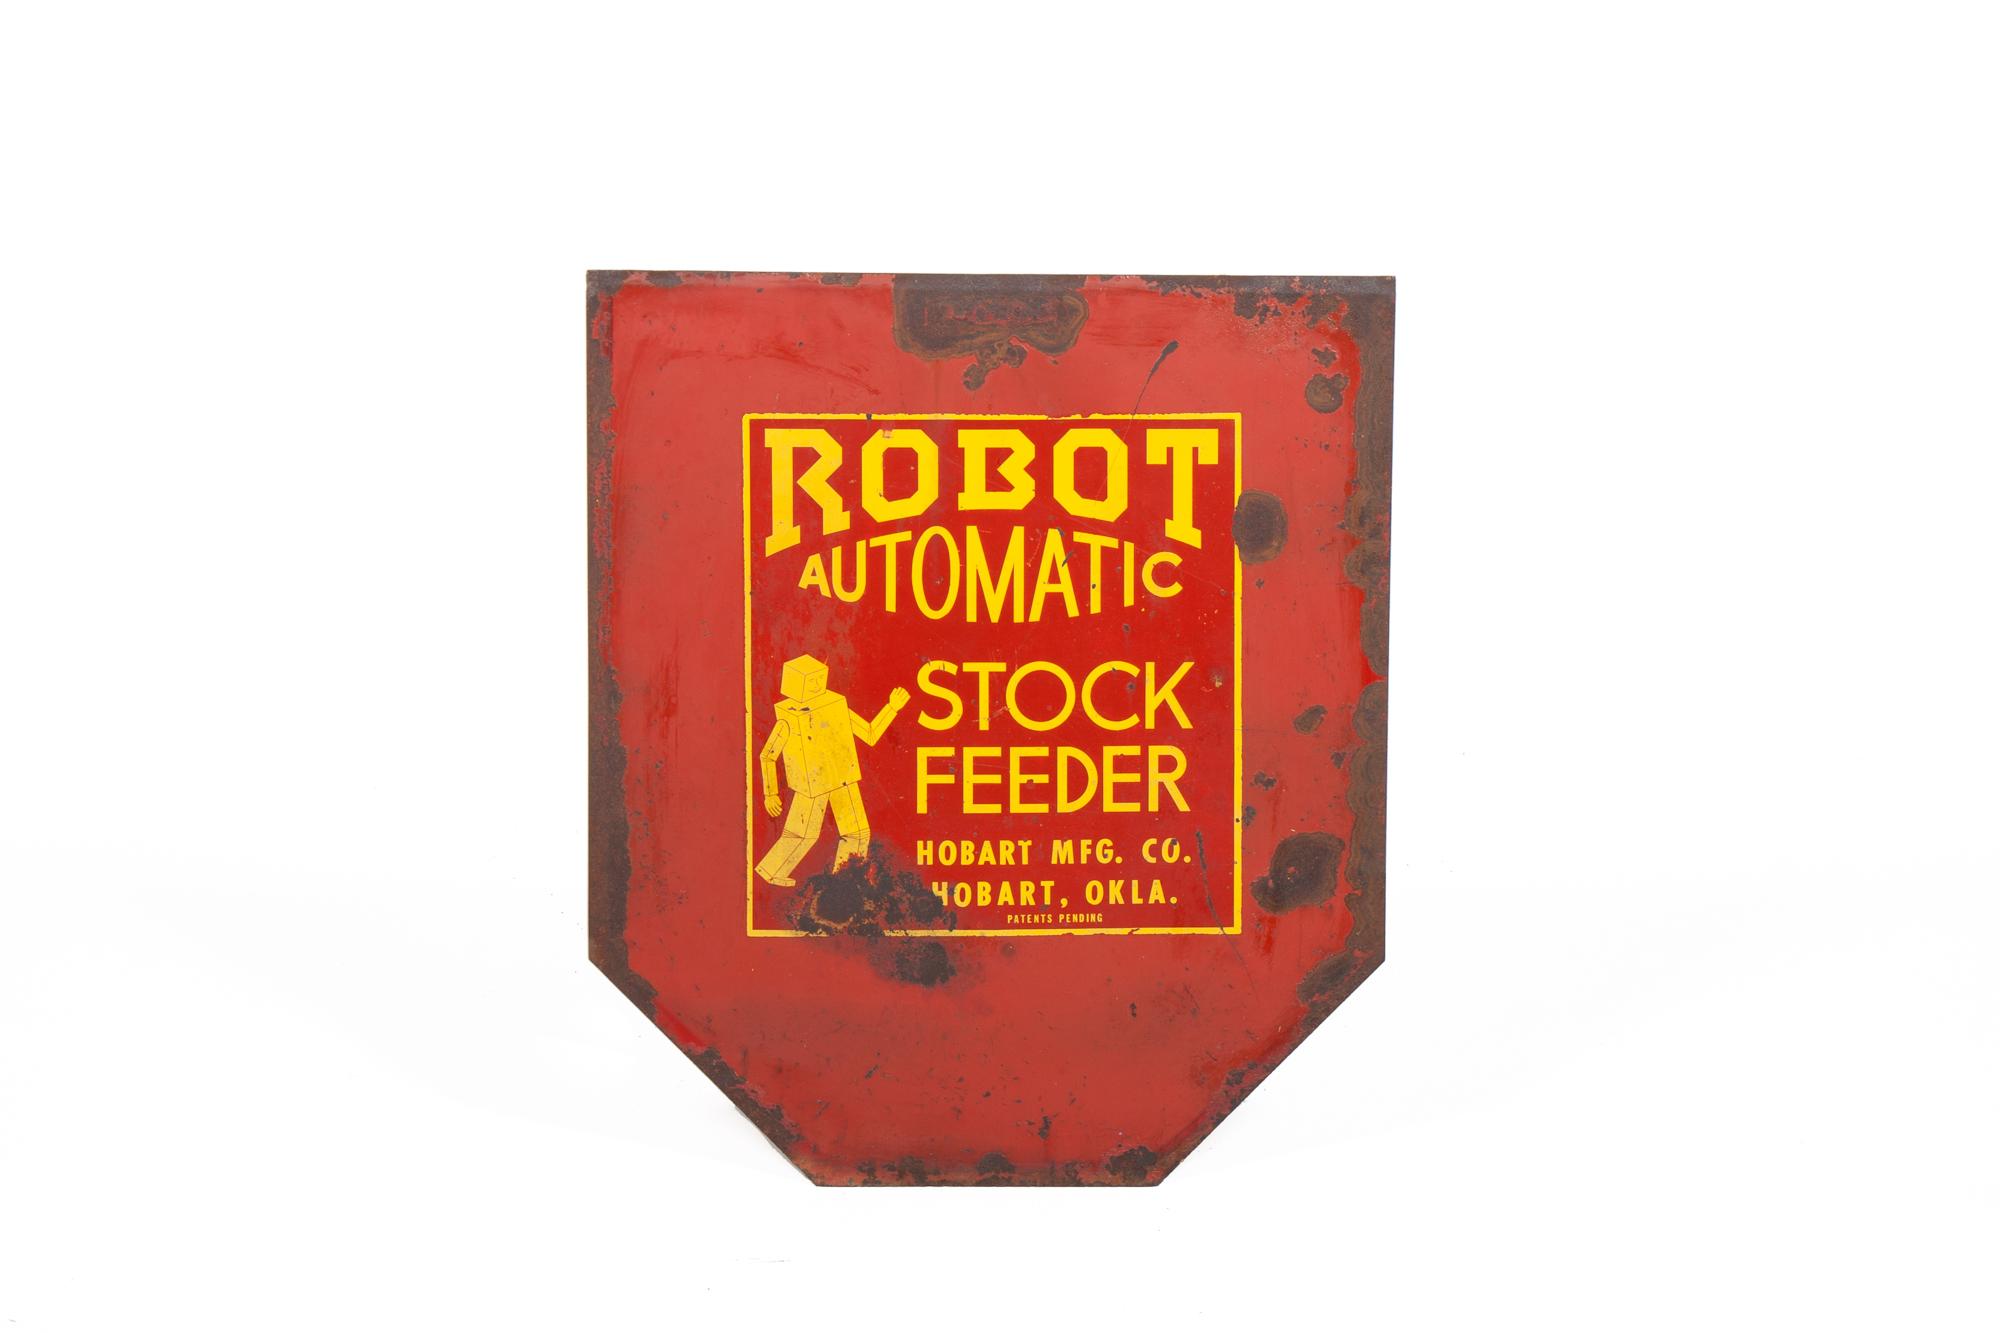 "Grain Chute Door – Robot Automatic Stock Feeder (circa 1950) - Height 2'3"""